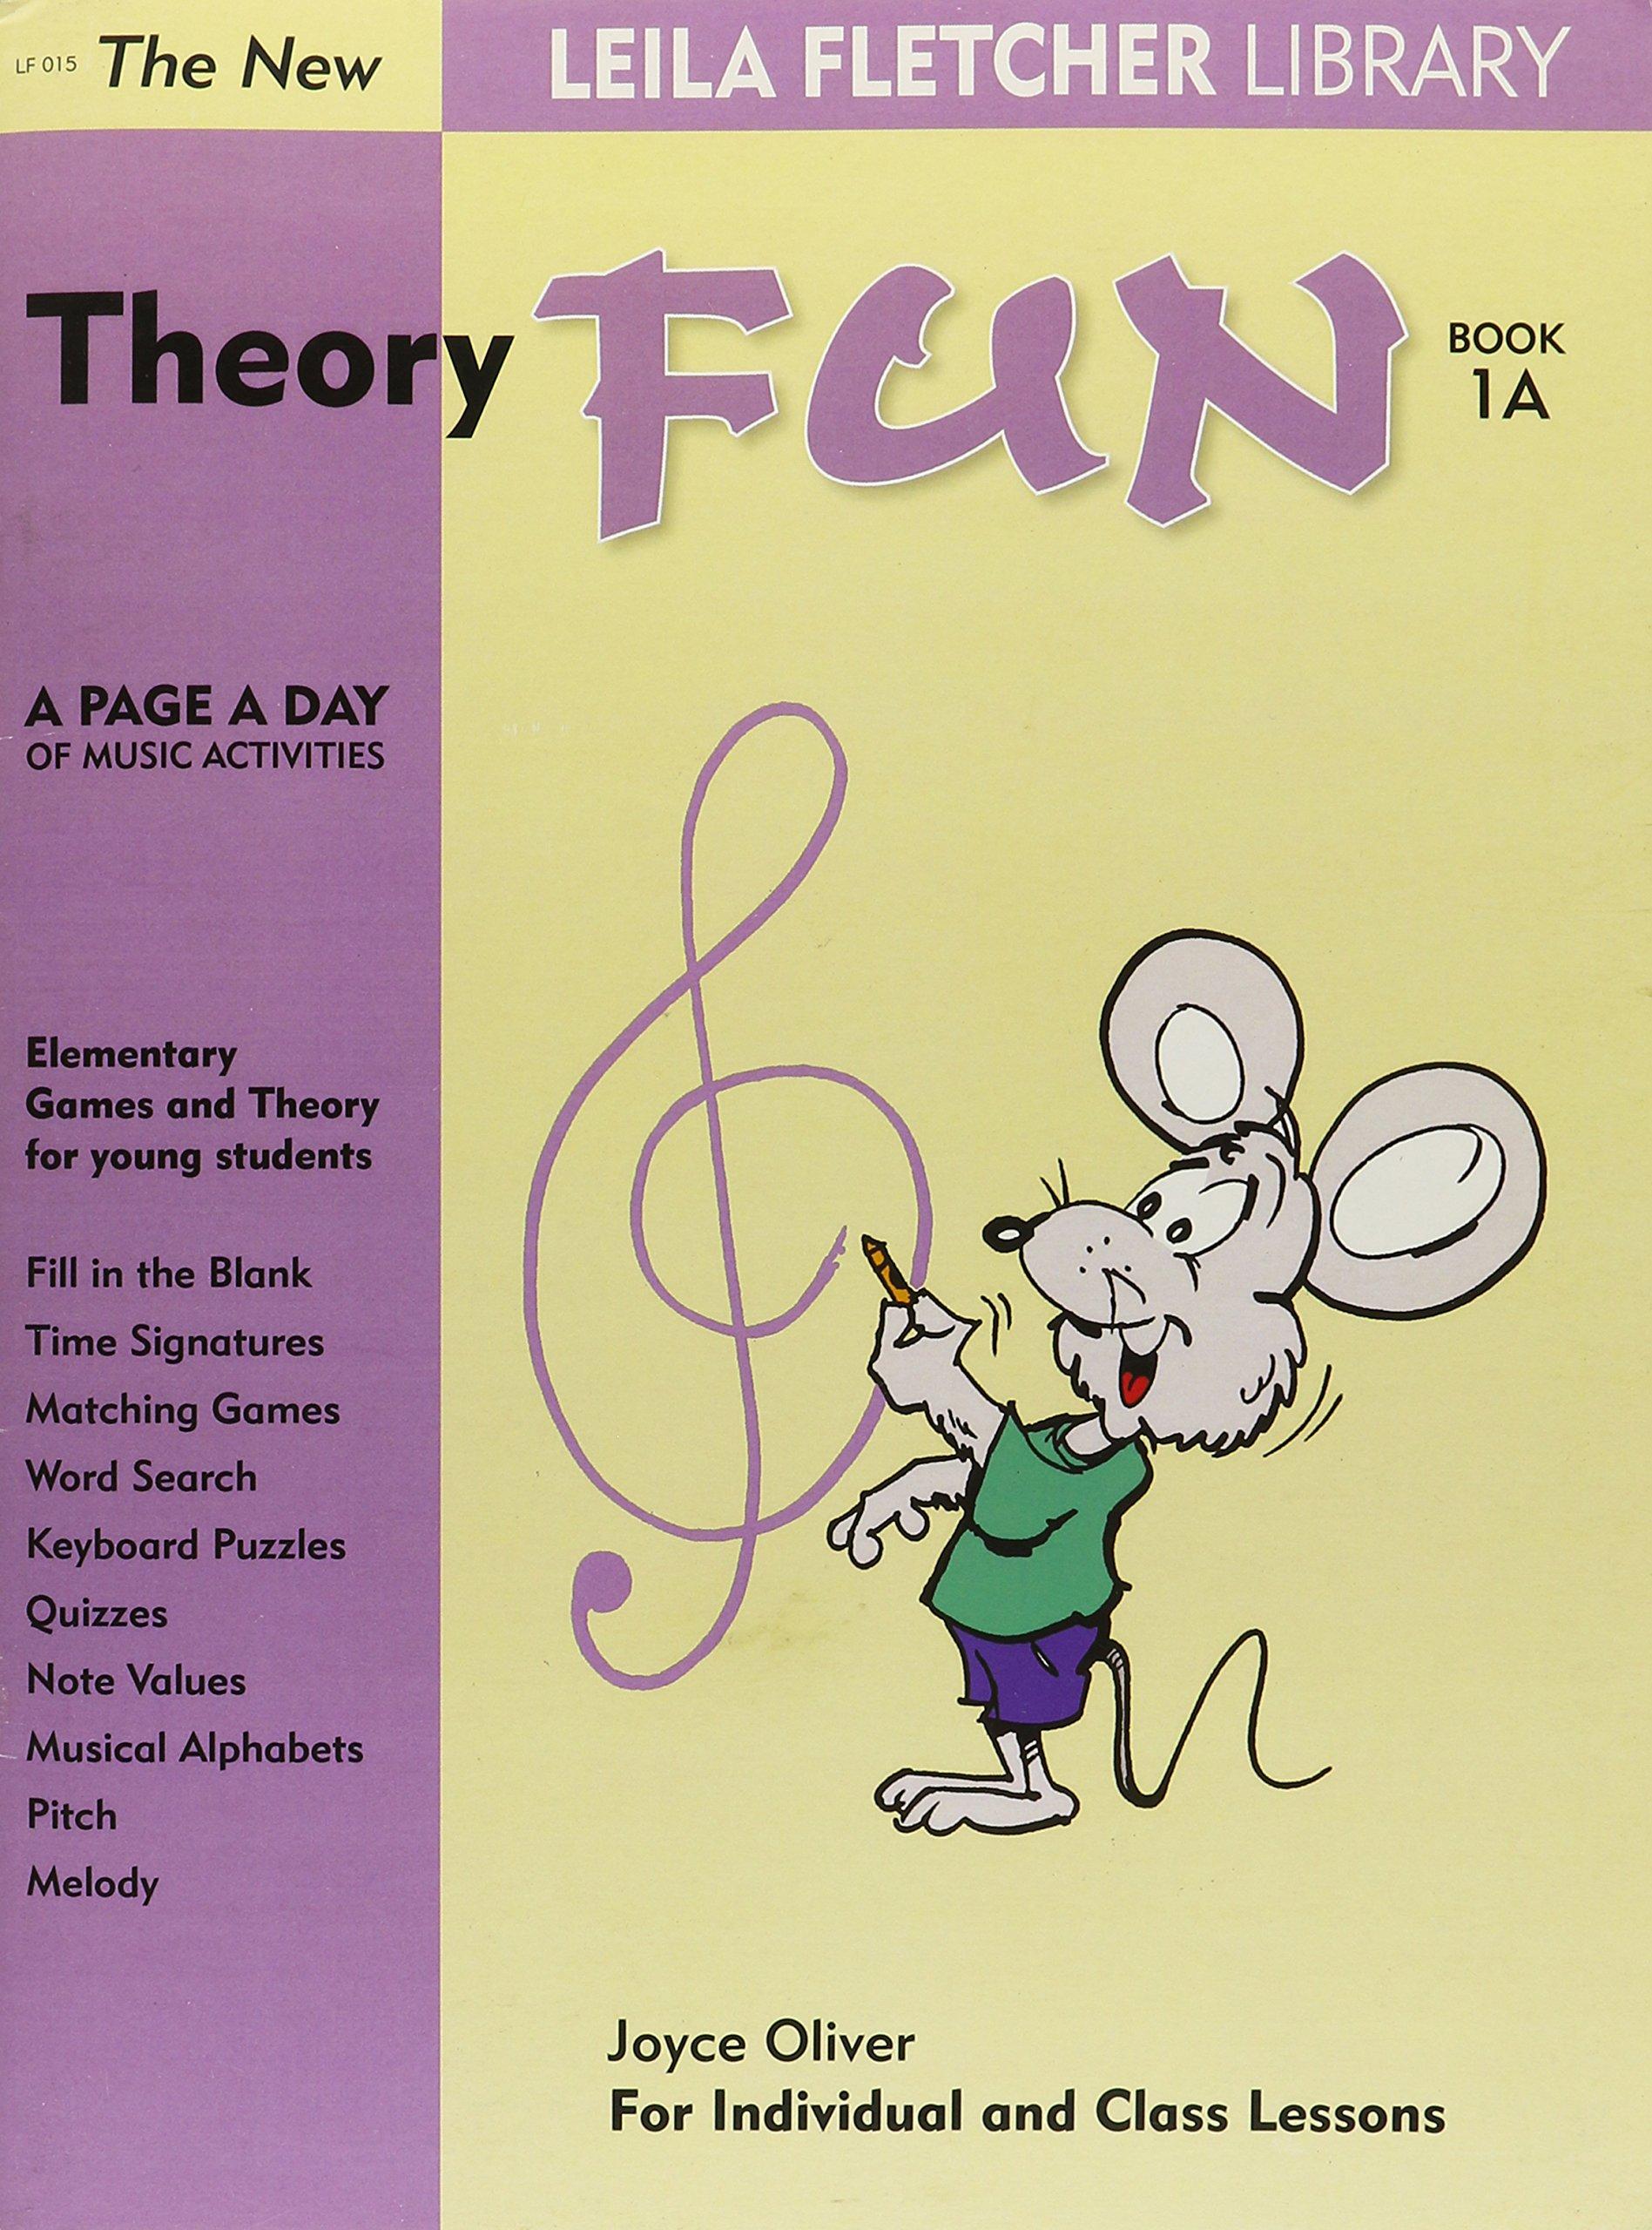 Leila Fletcher Music THEORY FUN Book 1B  by Debra Wanless.